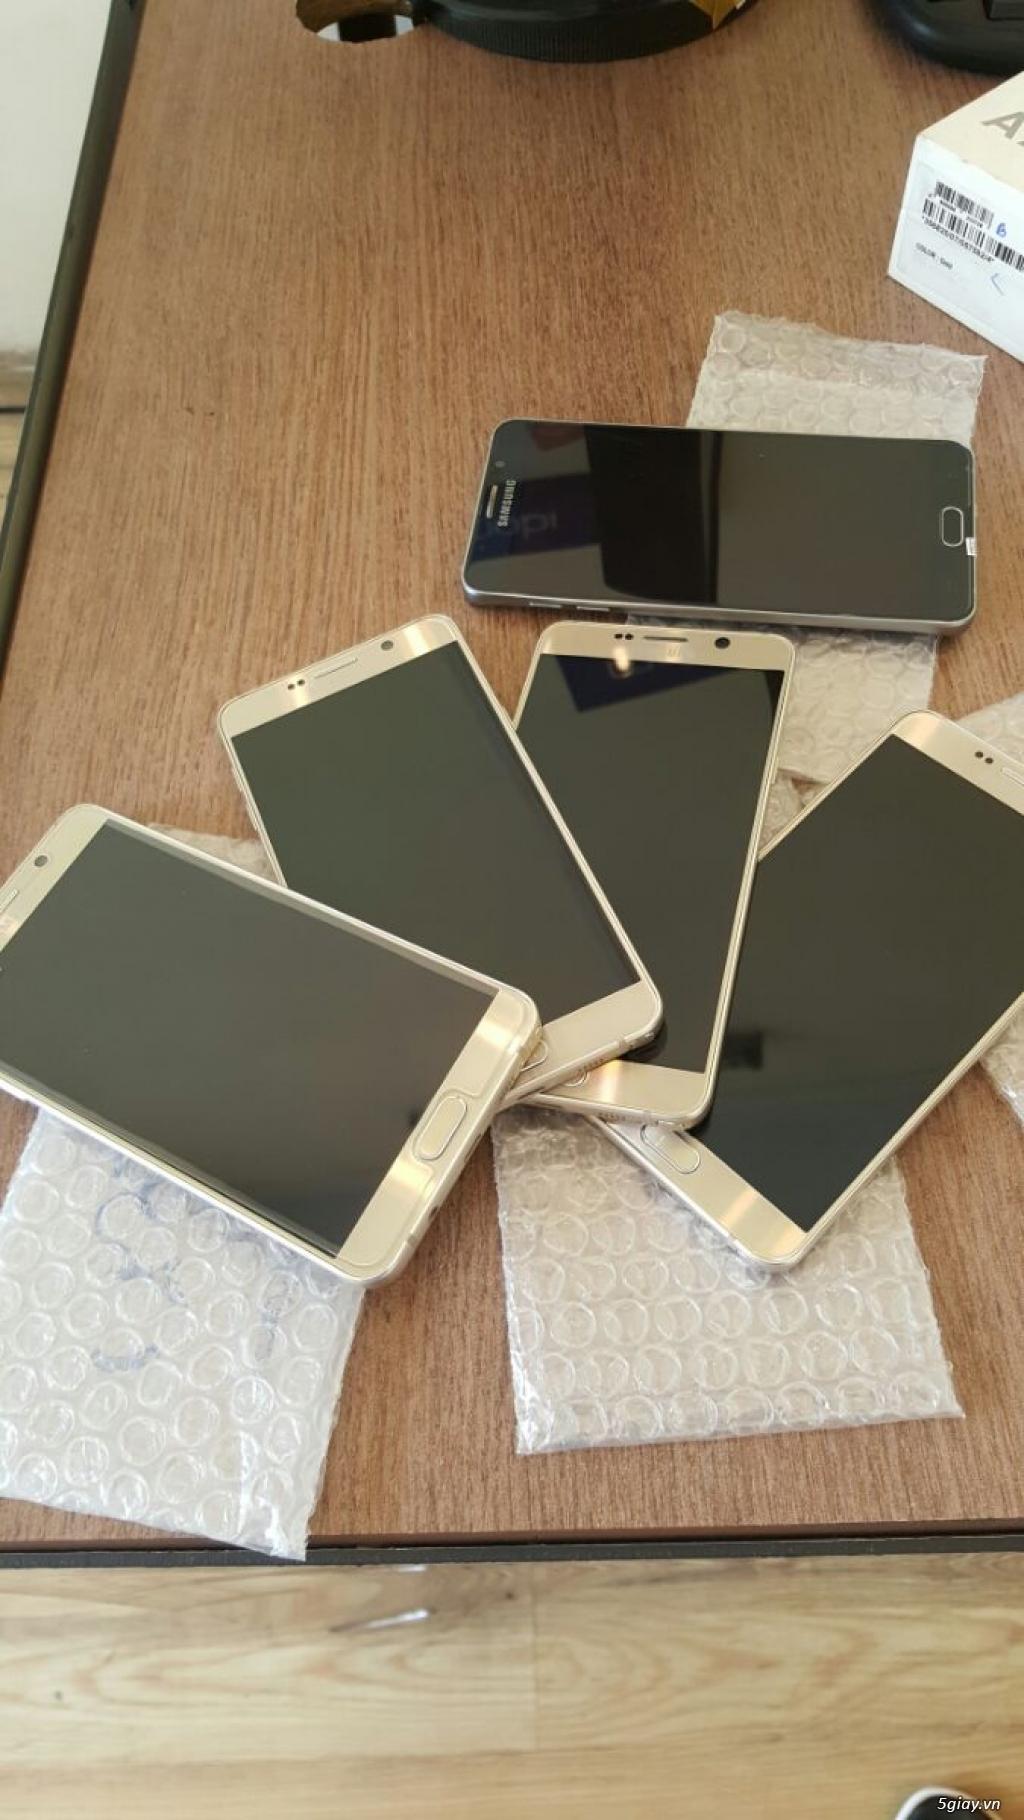 sale off SAMSUNG NOTE 5, S6 edge , A7 2016, NOTE 4, NOTE 3, LG 3 hàng quốc Pin zin các dòng samsung - 4